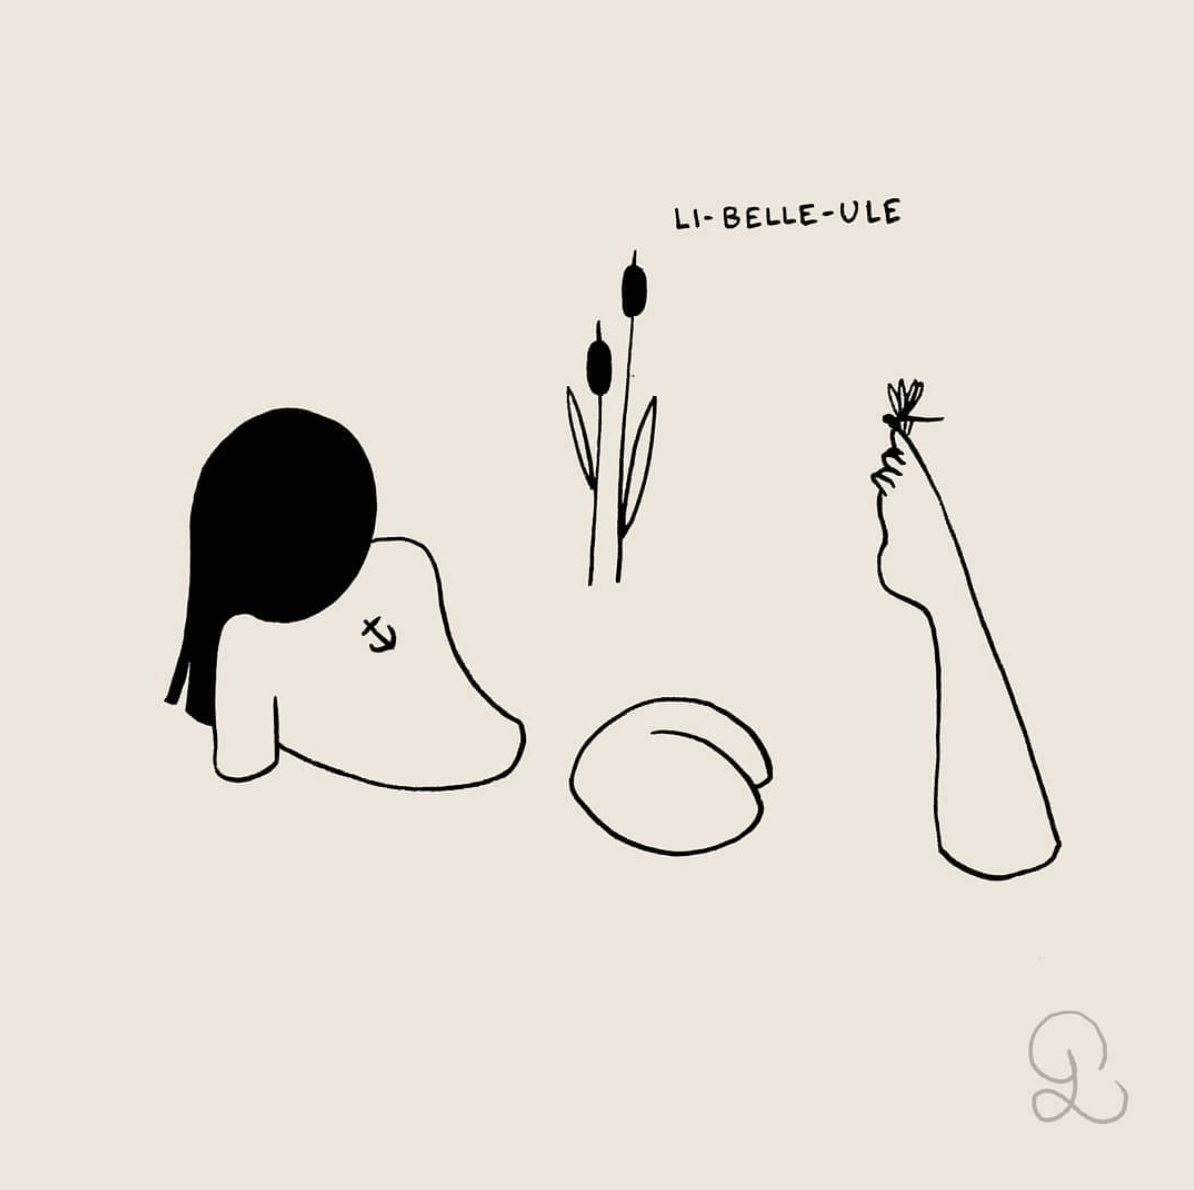 li-bell-ula